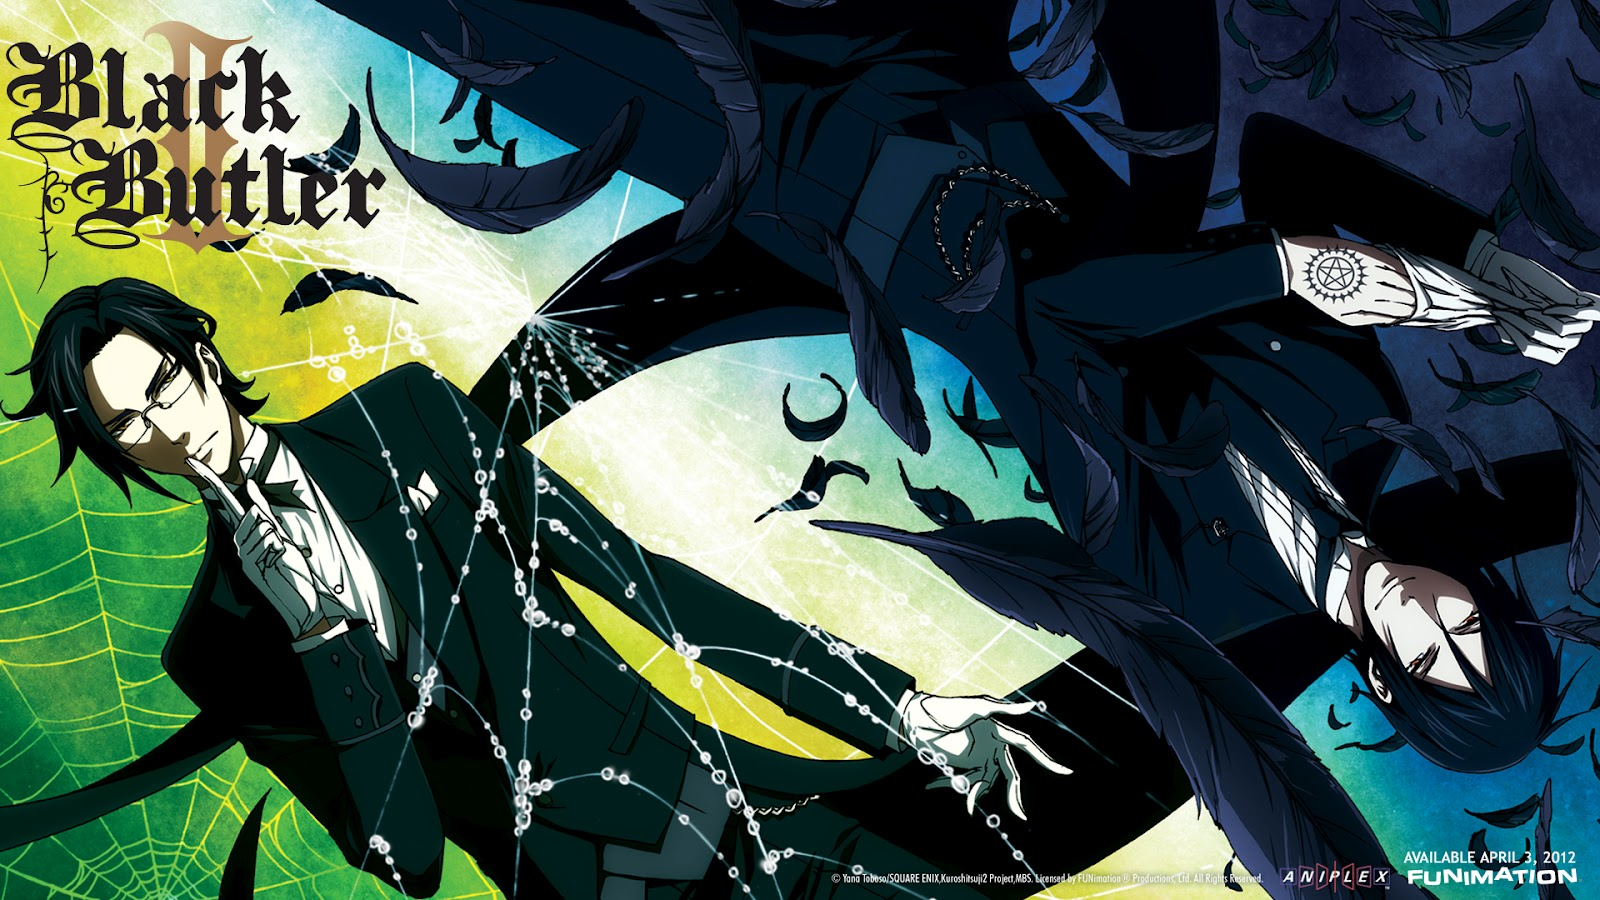 Black Butler Wallpaper 4 by Datfoxthou Black Butler Wallpaper 4 by Datfoxthou